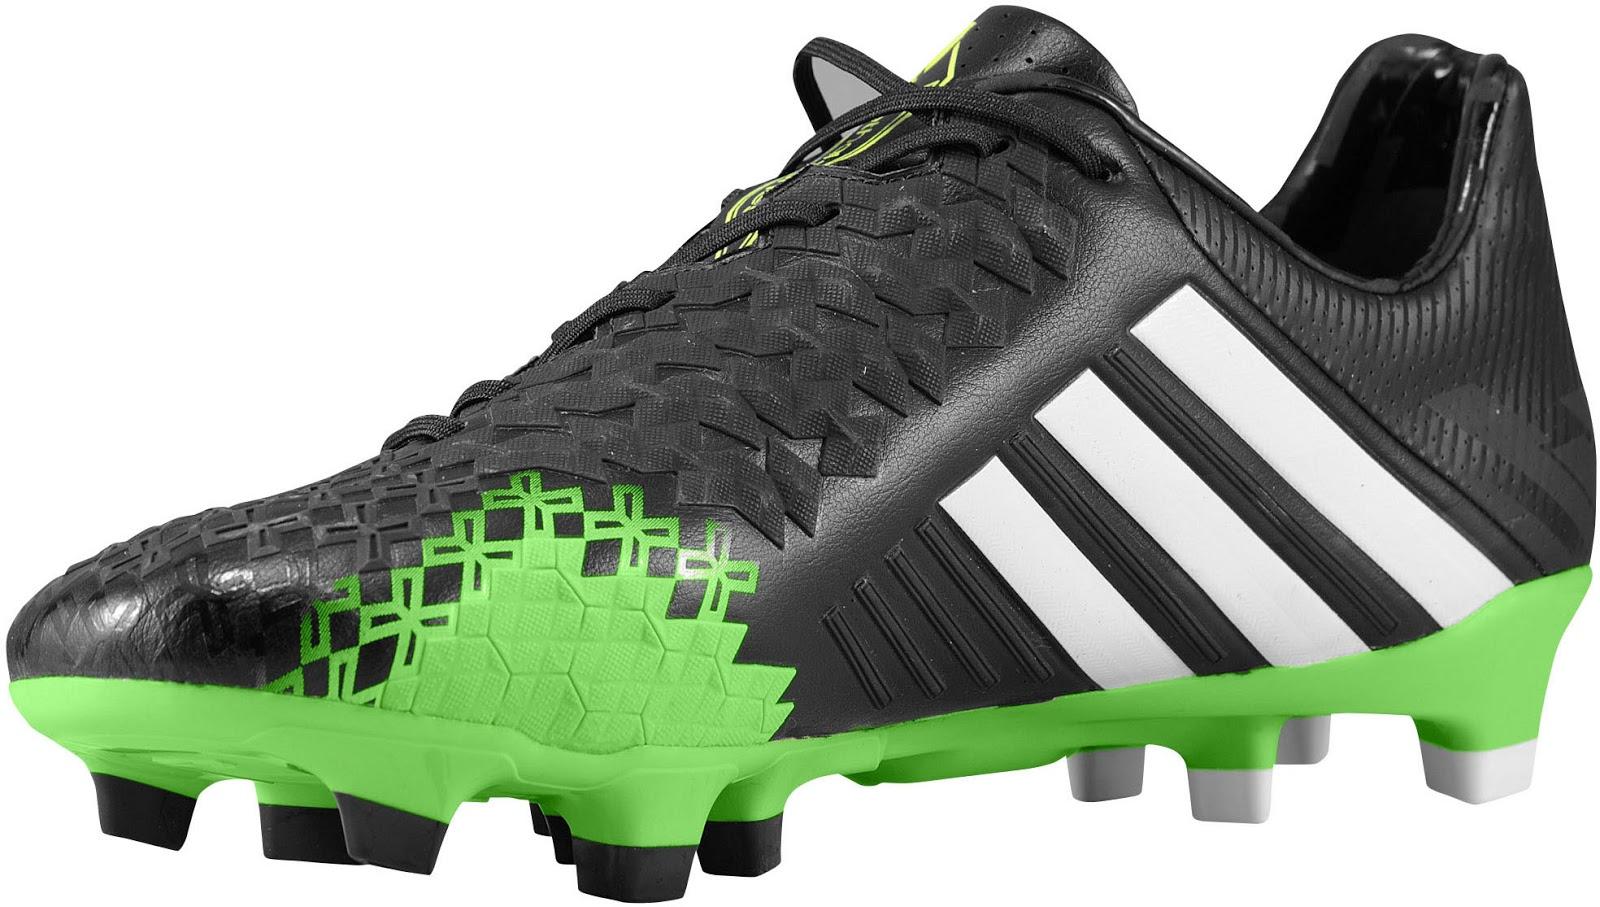 Adidas Predator Lz 2 Boot Released 2 Lethal Zones Ii